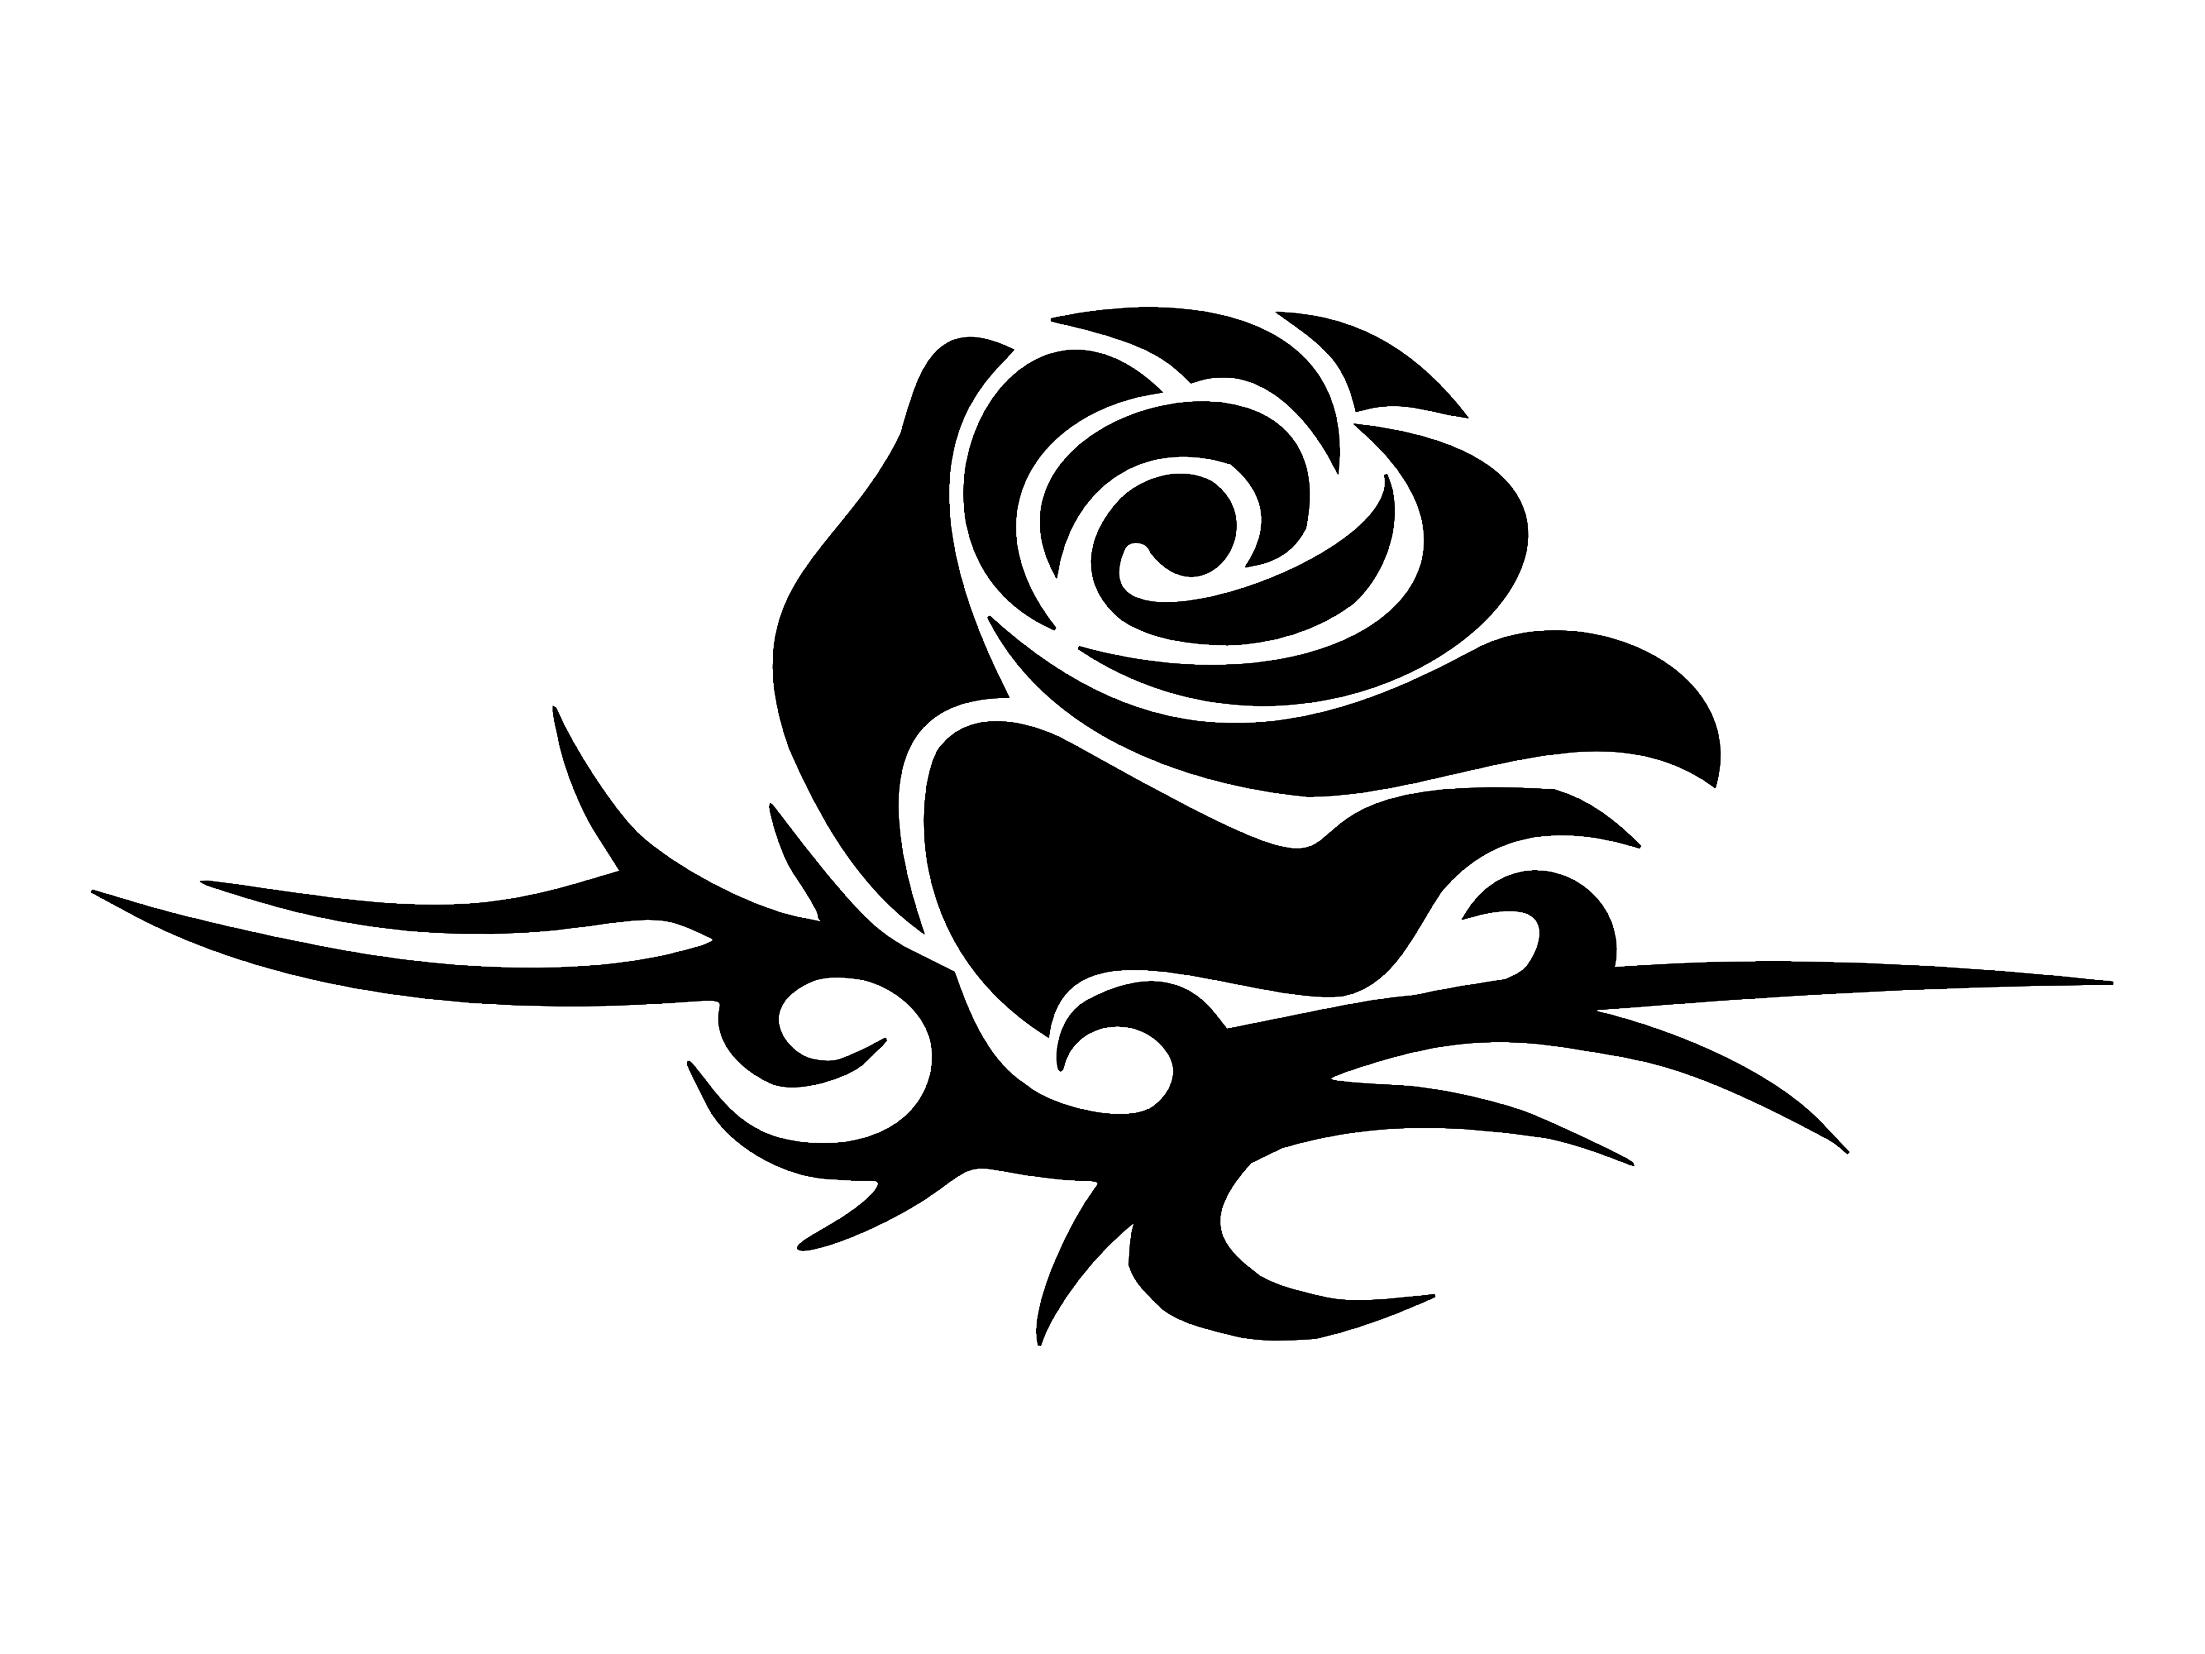 tattoo of tribal rose perfection love tattoo custom tattoo designs mitzy pinterest. Black Bedroom Furniture Sets. Home Design Ideas